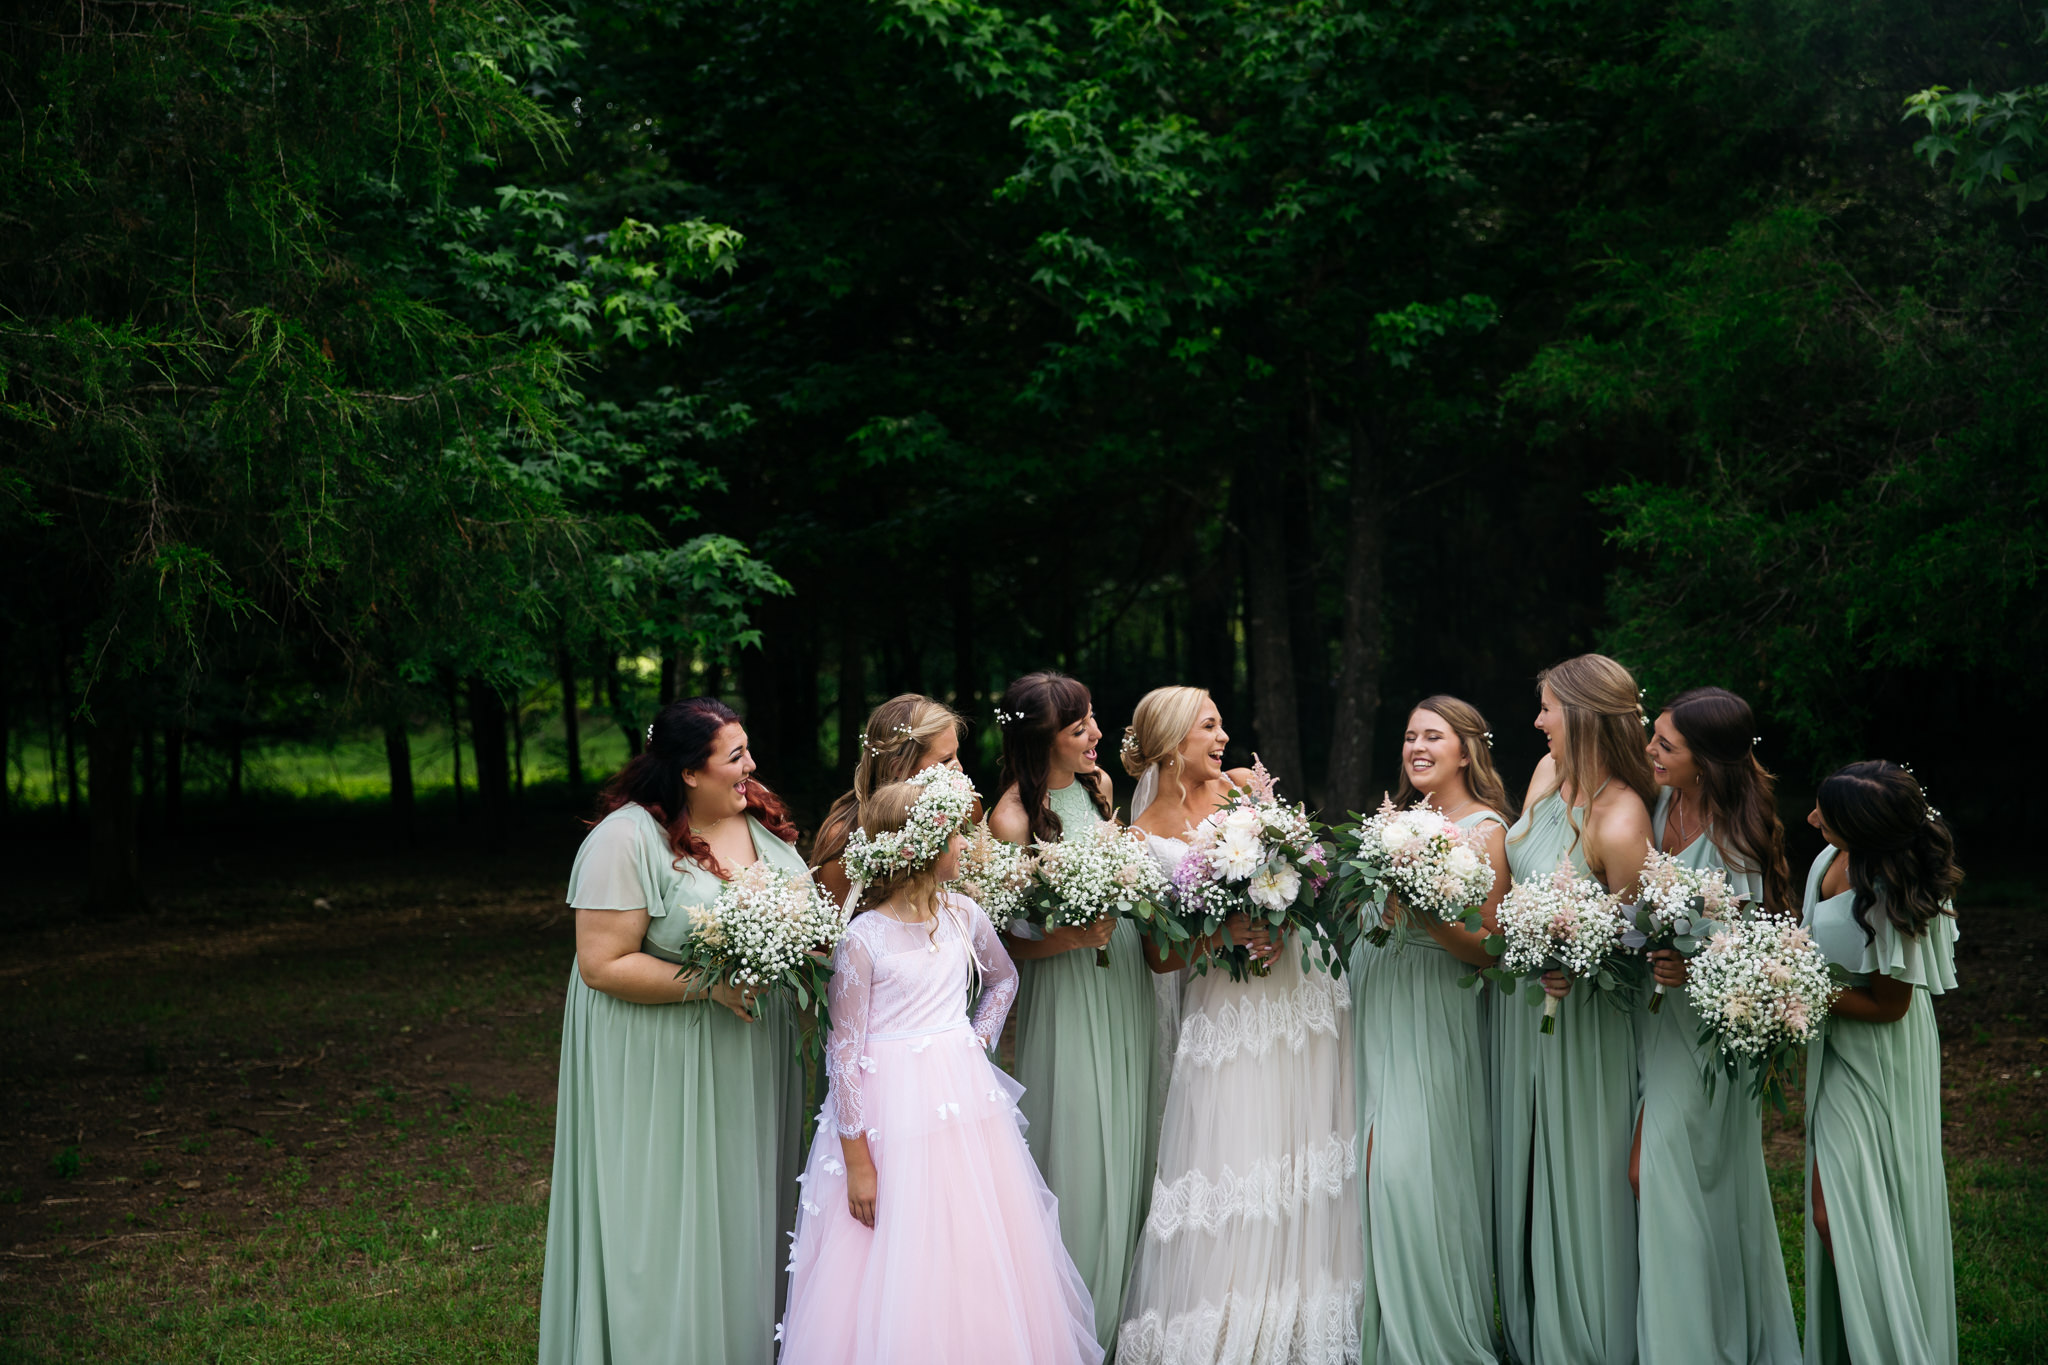 backyard-wedding-thewarmtharoundyou-lexy-branson-34.jpg